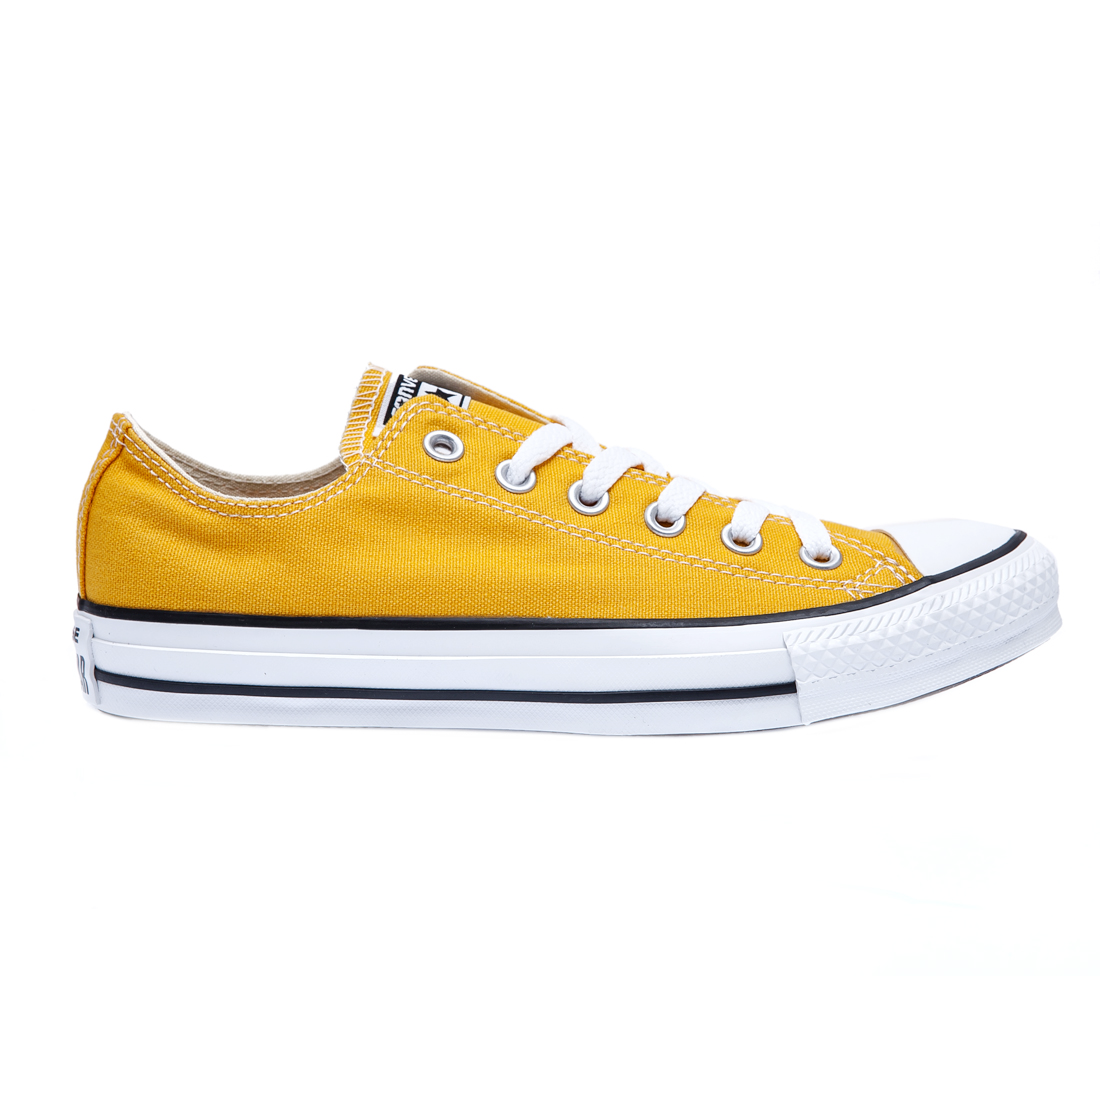 CONVERSE – Unisex παπούτσια Chuck Taylor κίτρινα σκούρα